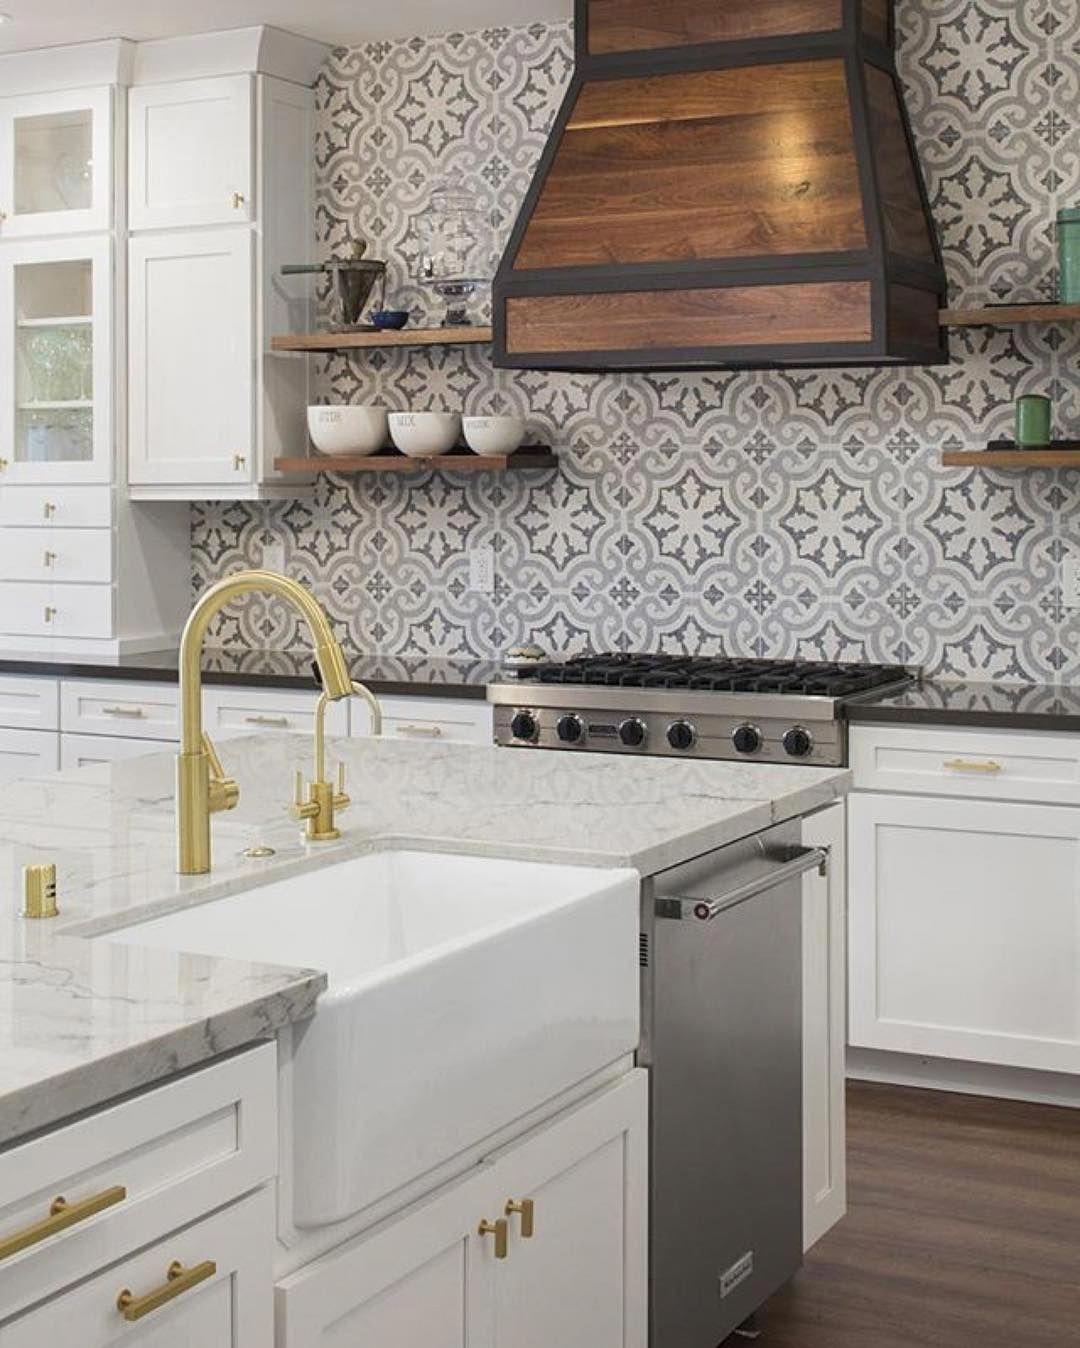 wood hood vent im renovating again kitchen backsplash kitchen rh pinterest com